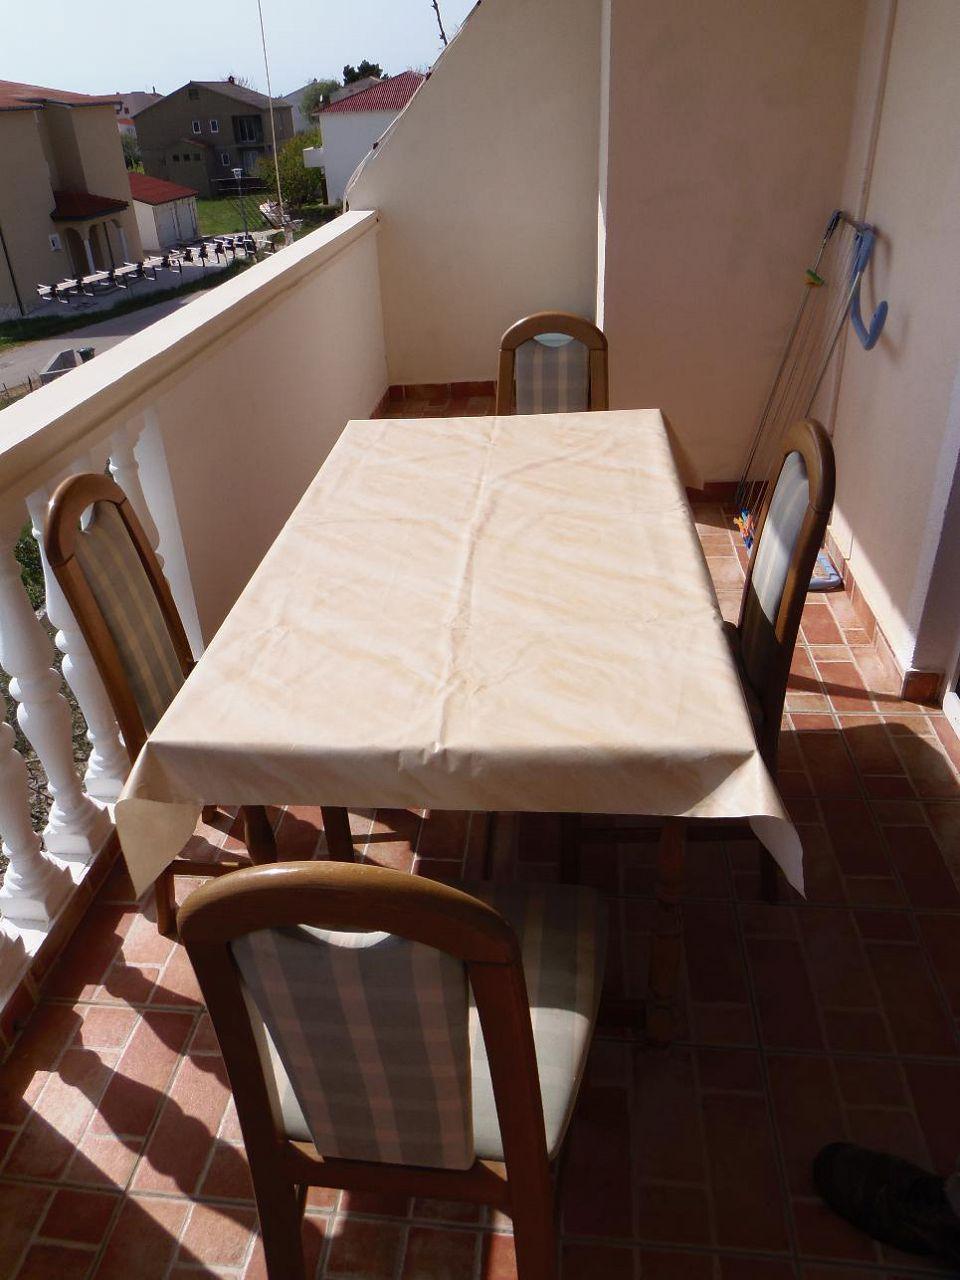 2235 - Povljana - Appartementen Kroatië - A2 veliki (2+2): overdekt terras